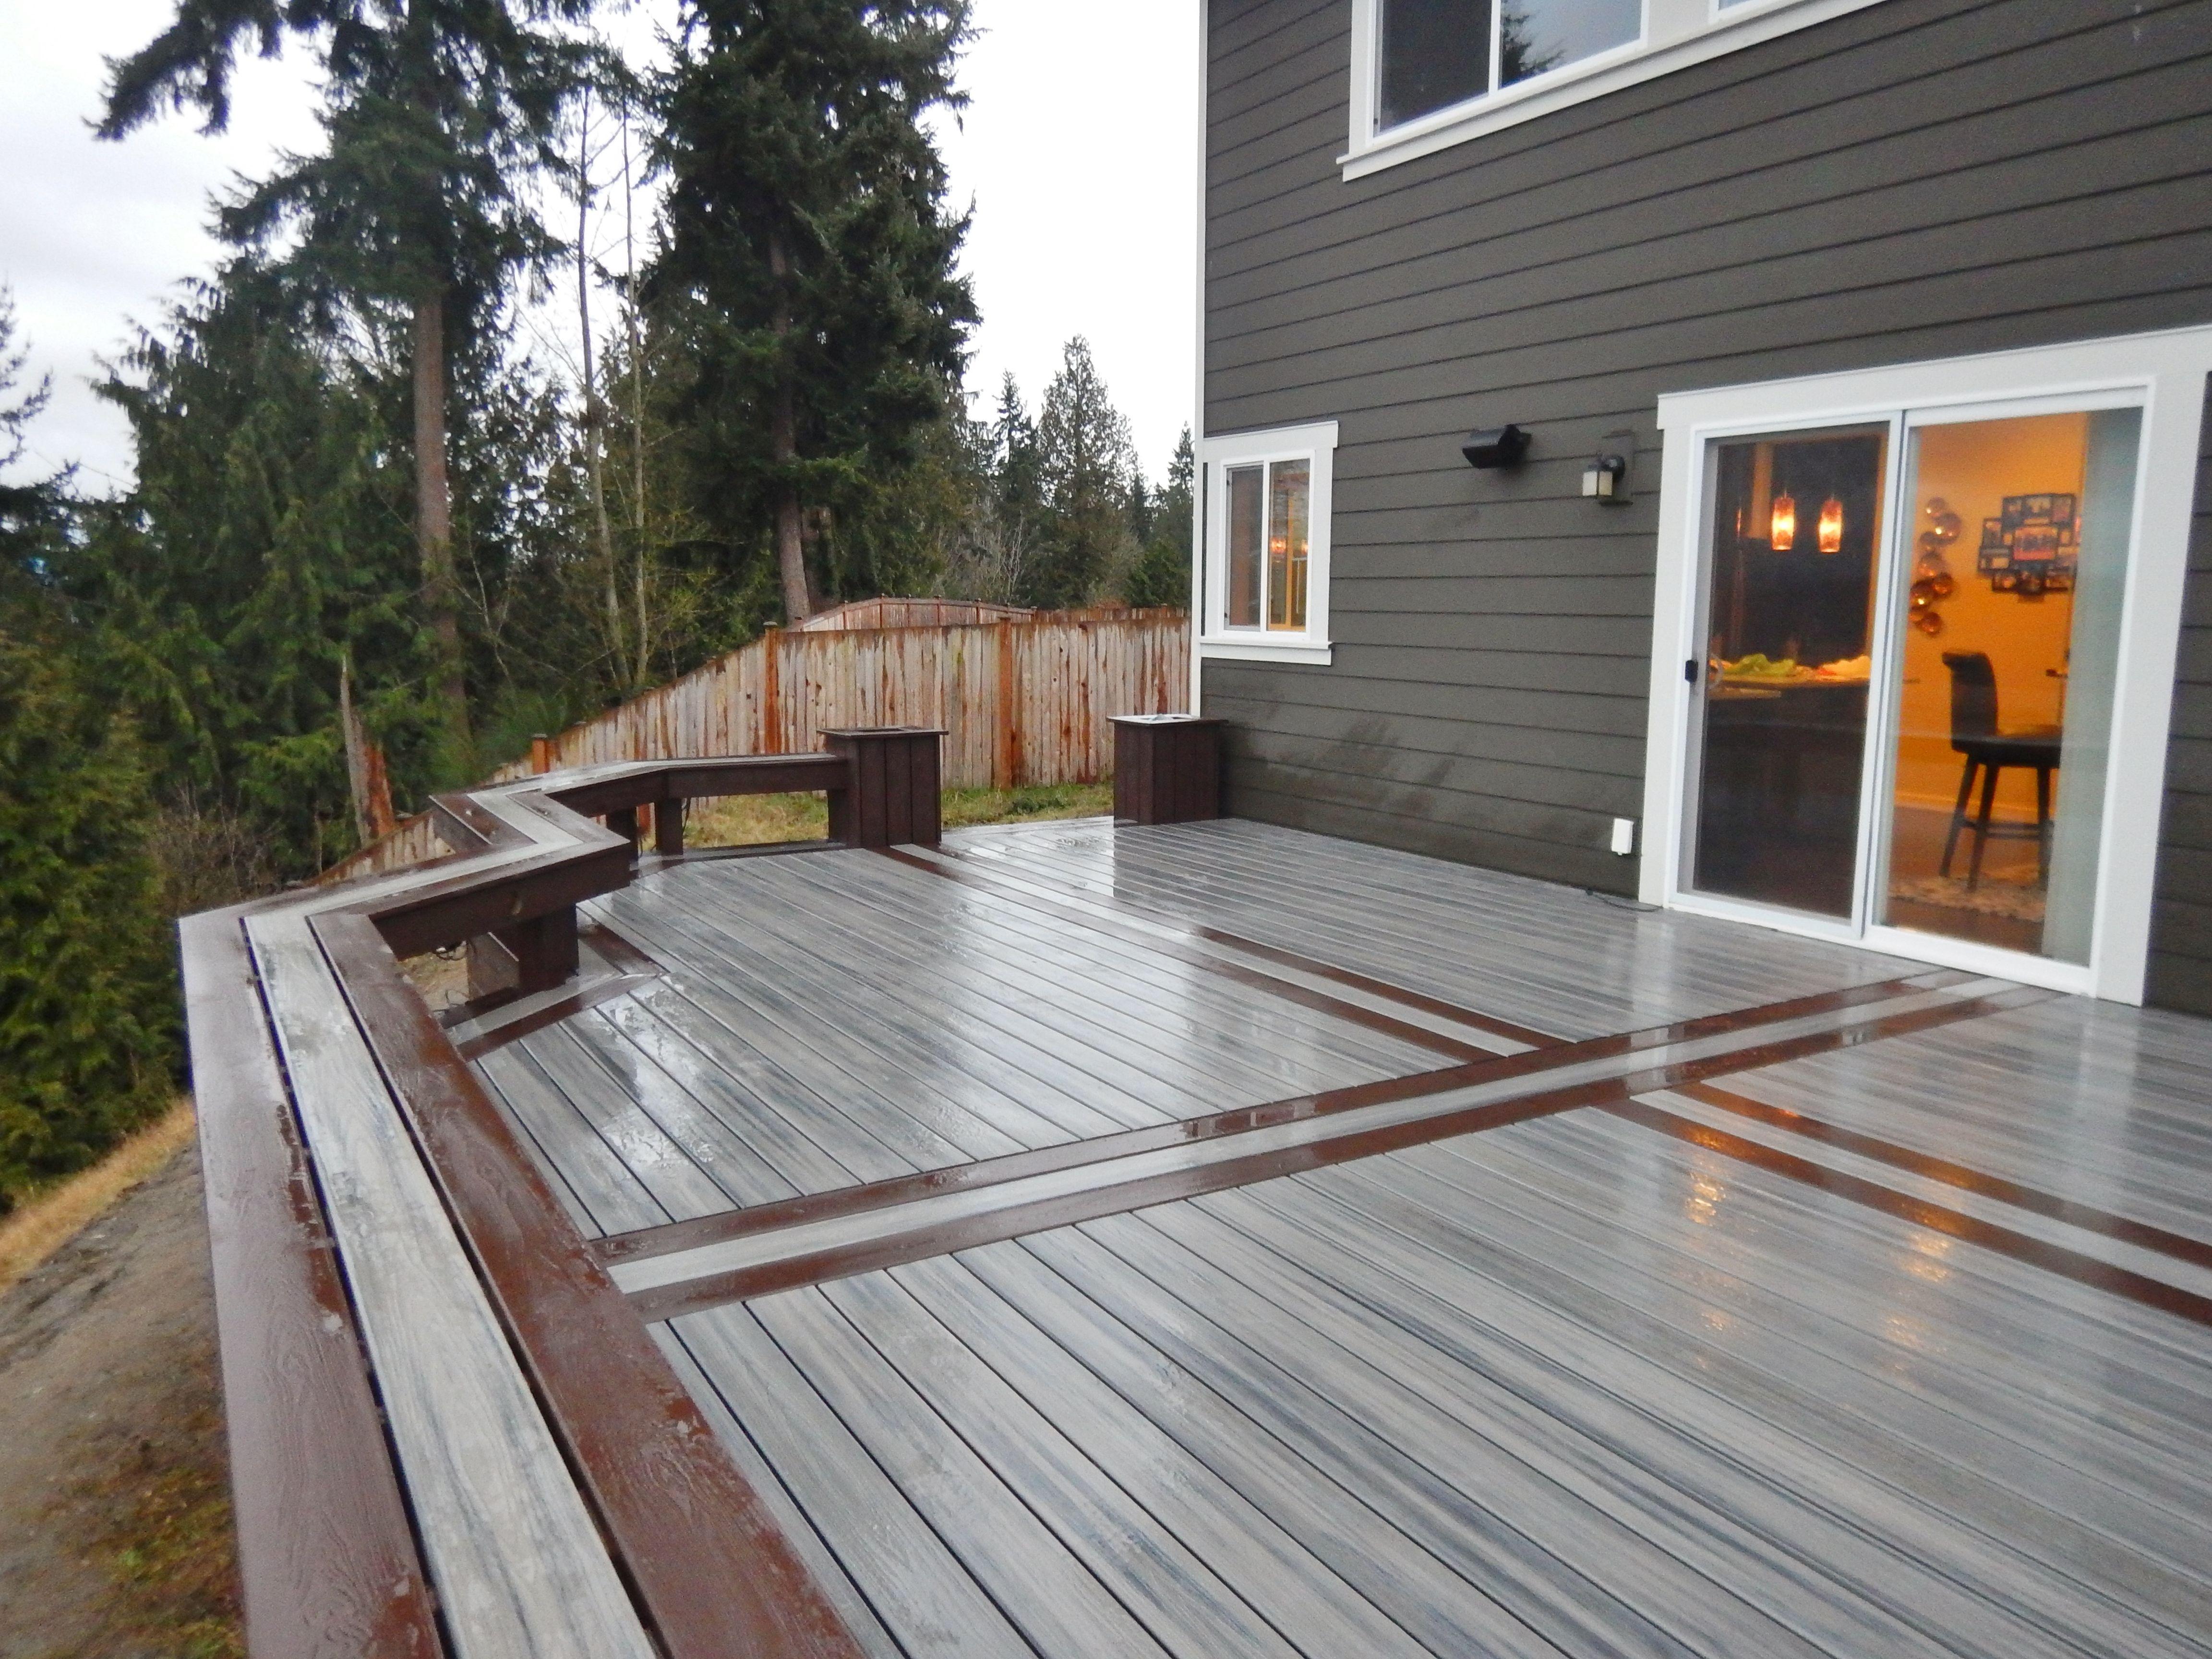 Trex Transcends Island Mist With A Vintage Lantern Border Patio Deck Designs Small Backyard Decks Trex Deck